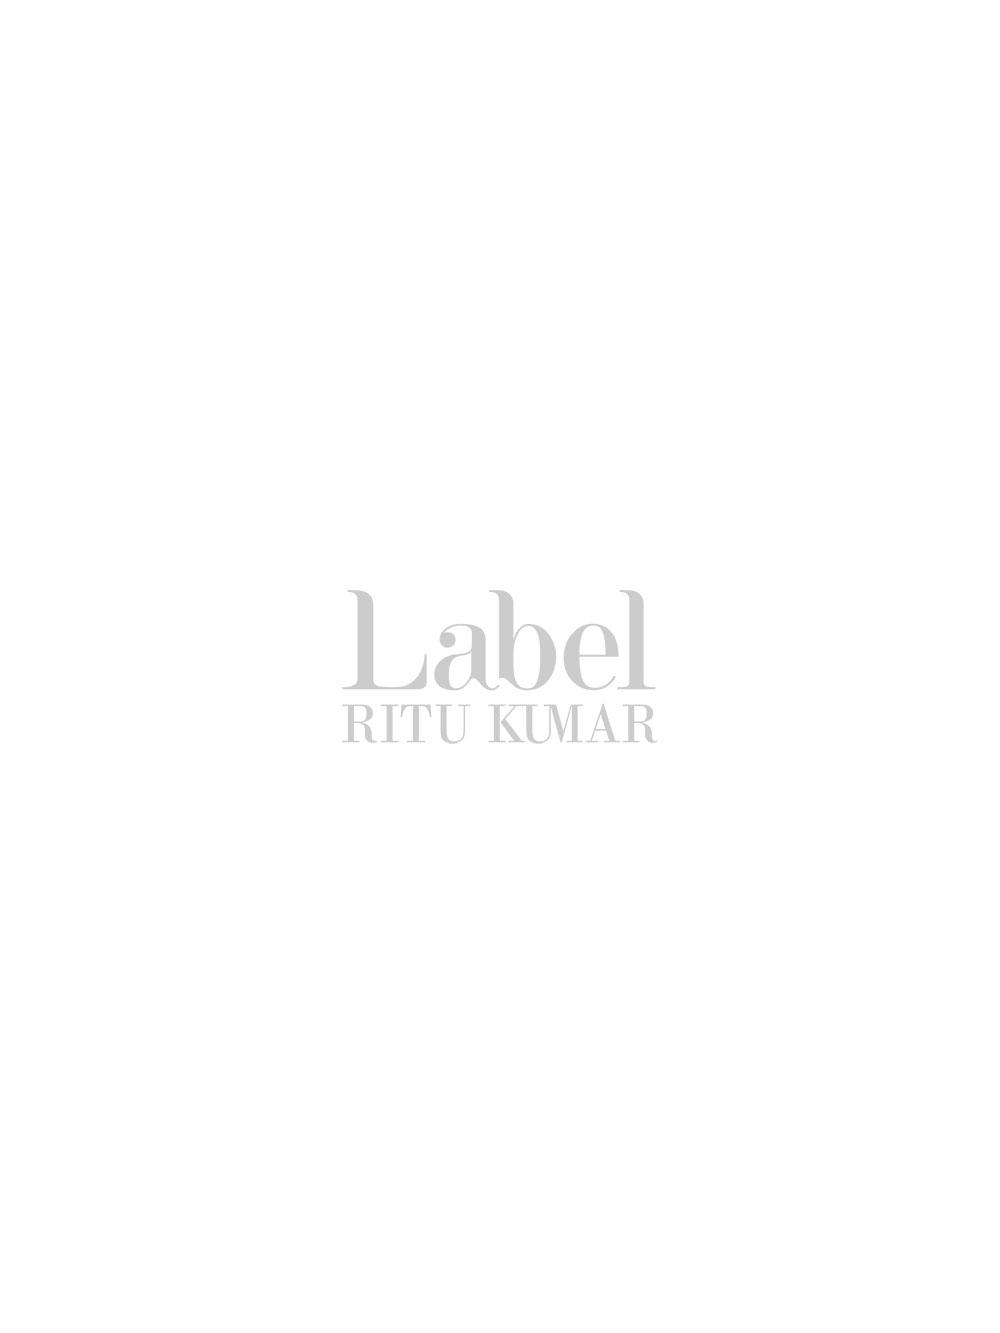 Grey Shirt with Signature Label Ritu Kumar Jodhpur Prints